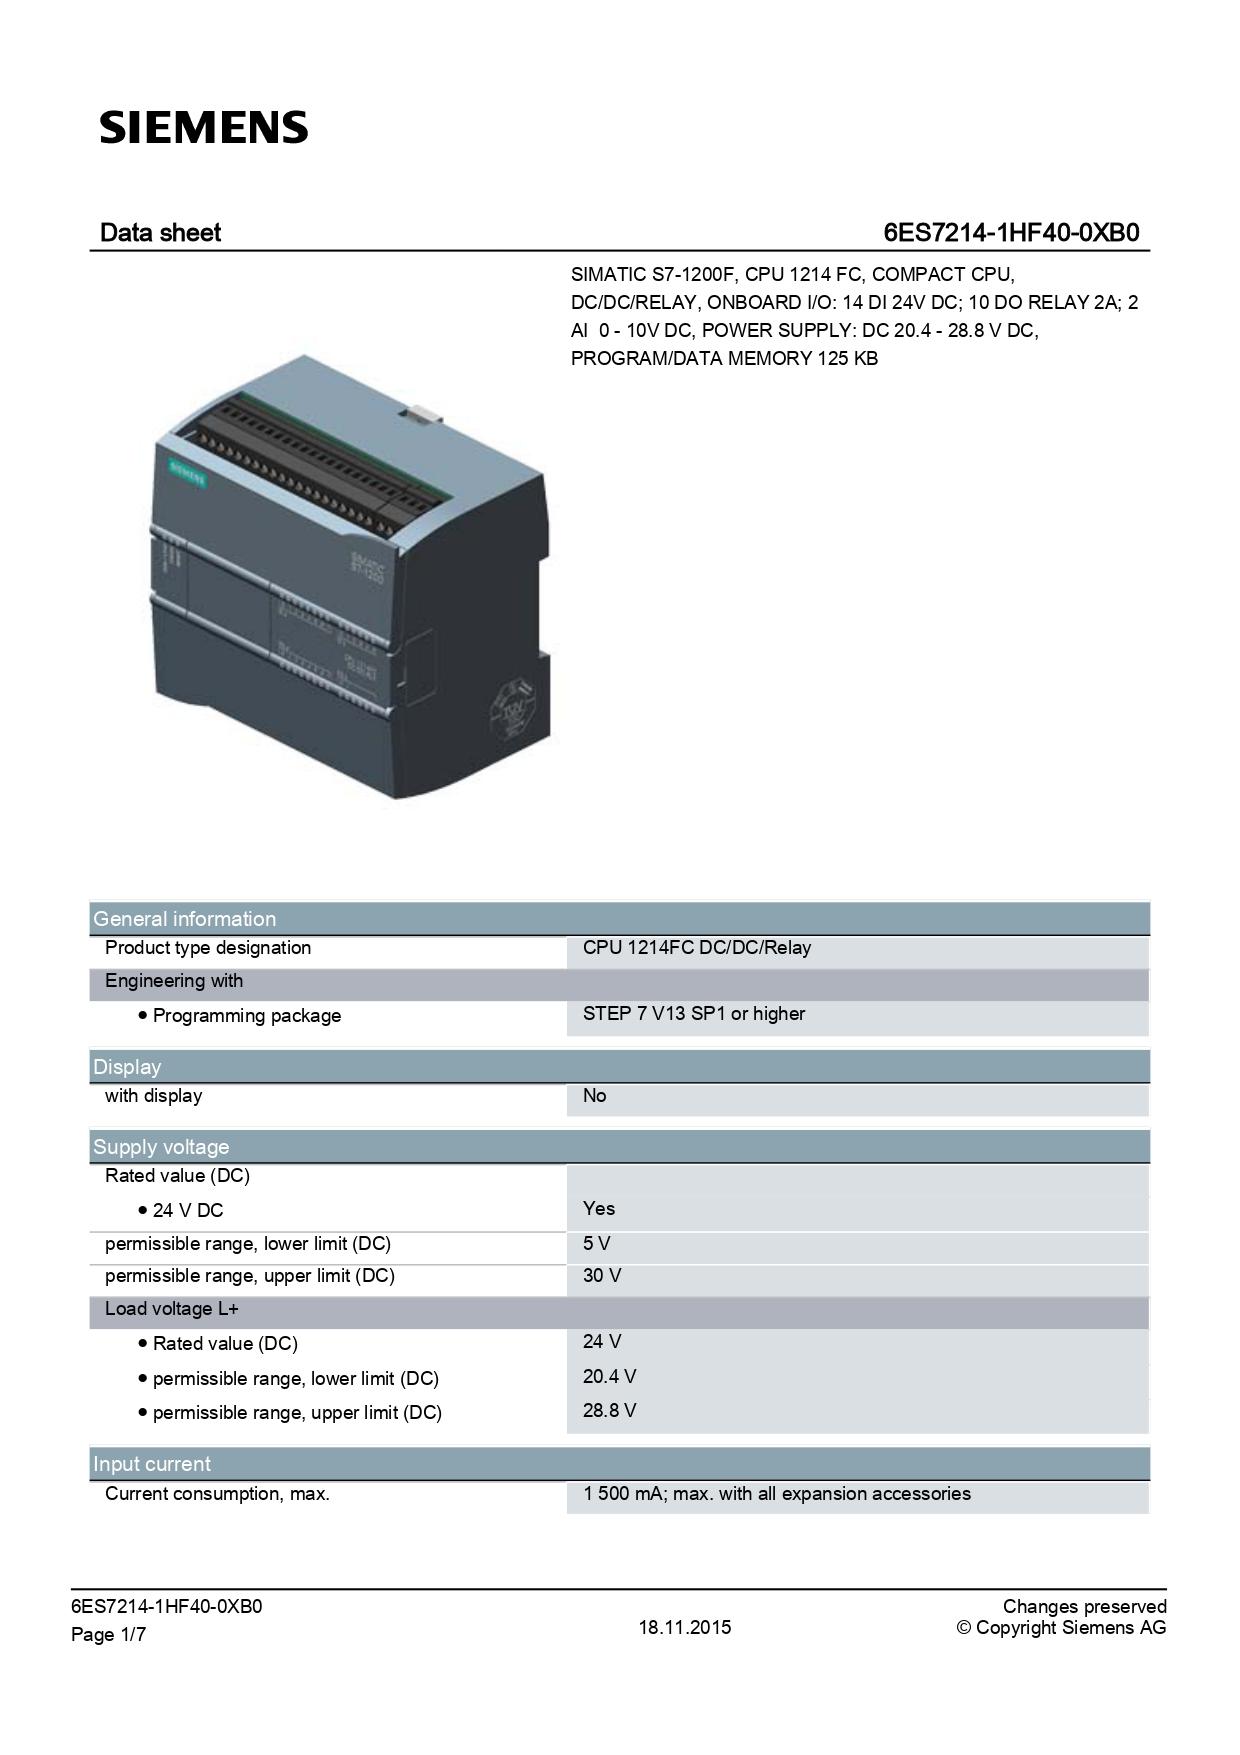 6ES7214-1HF40-0XB0_datasheet